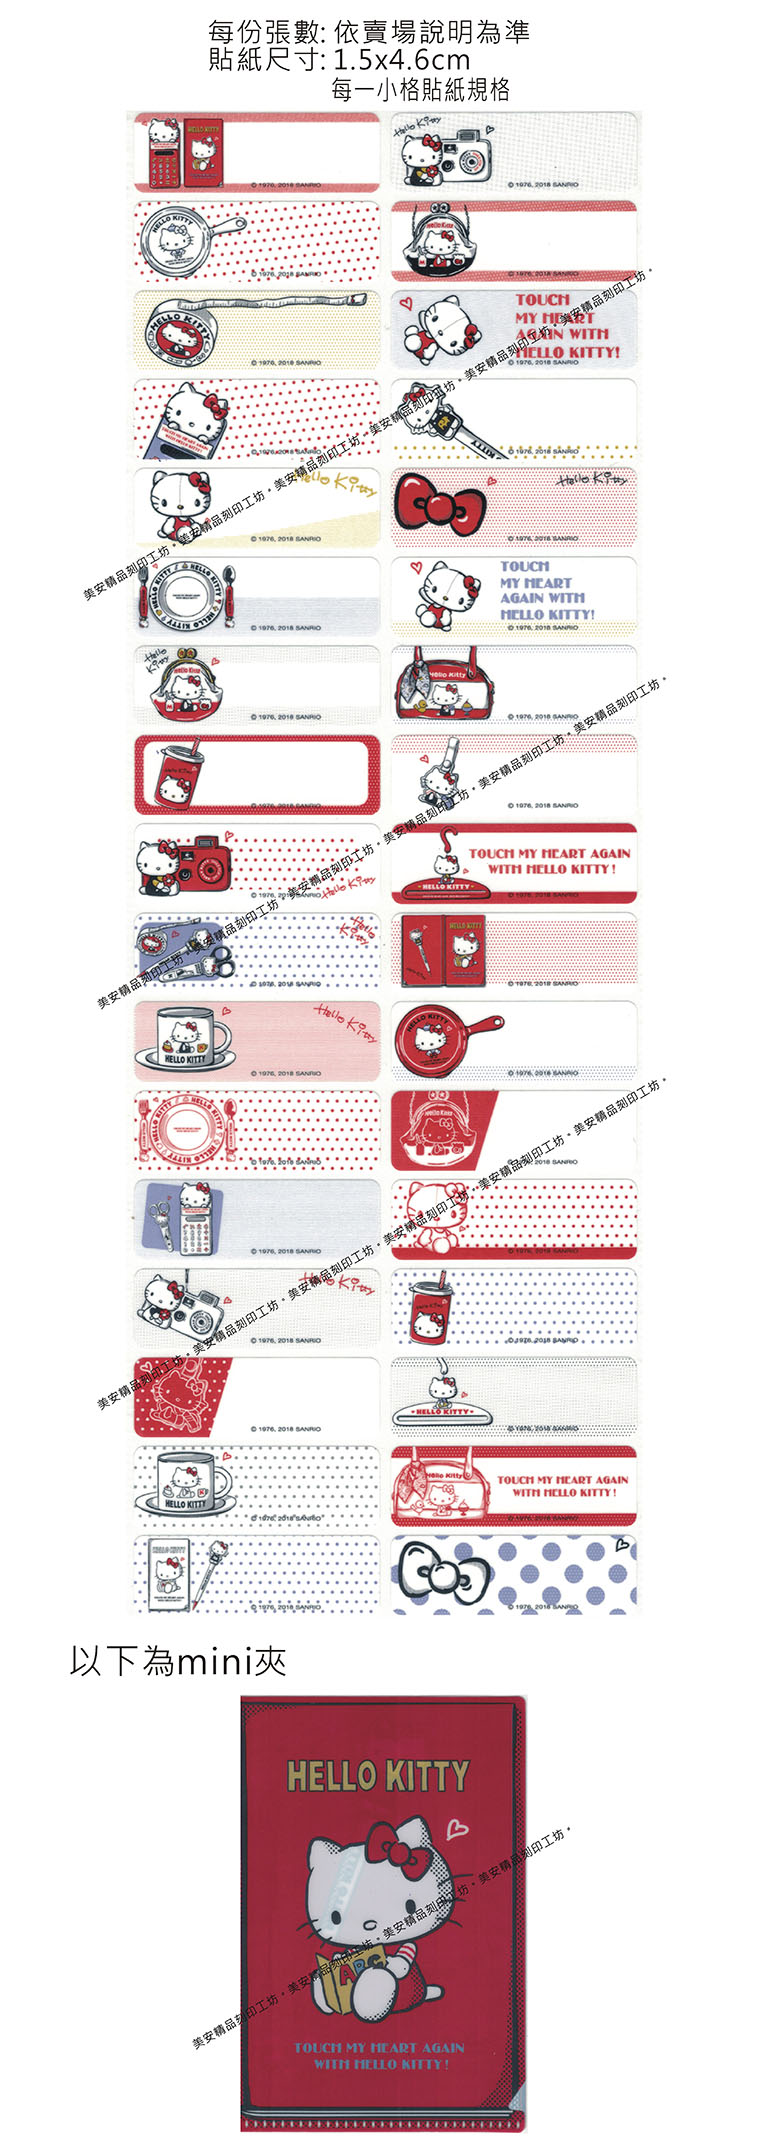 DE款KT ACTION RE touch三麗鷗授權-大型款姓名貼紙